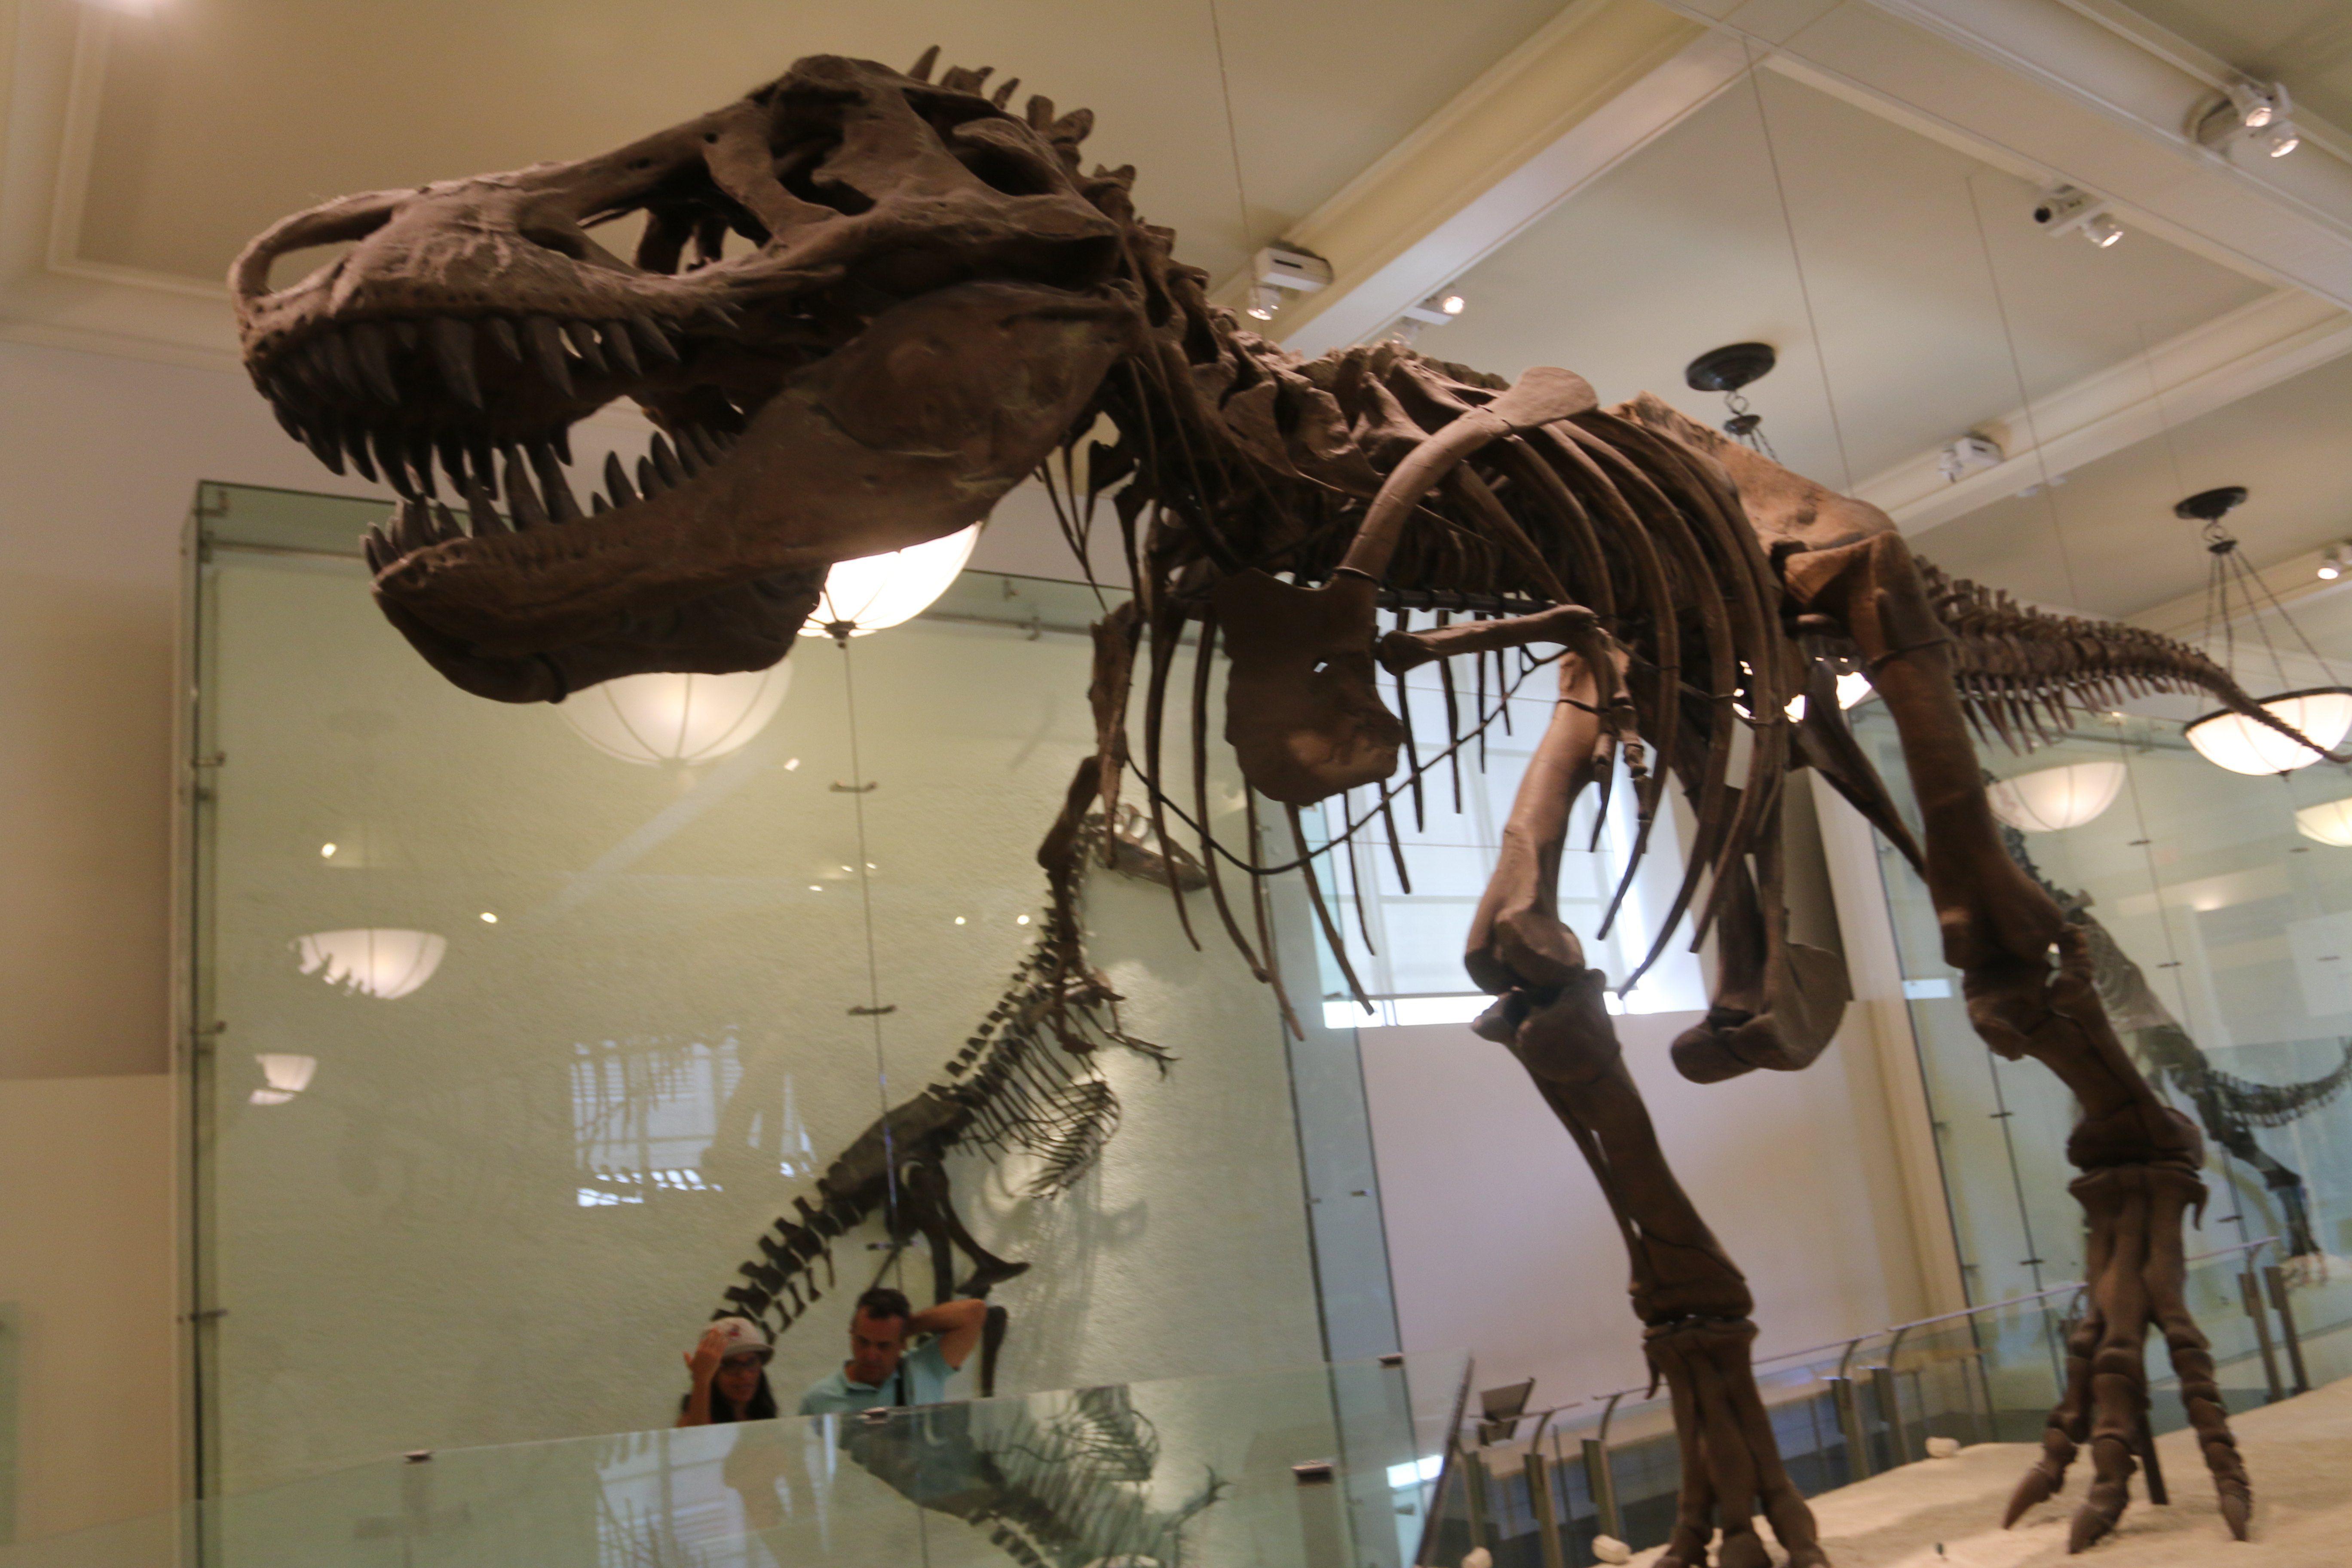 Roar-Worthy Getaways for Dinosaur-Loving Kids